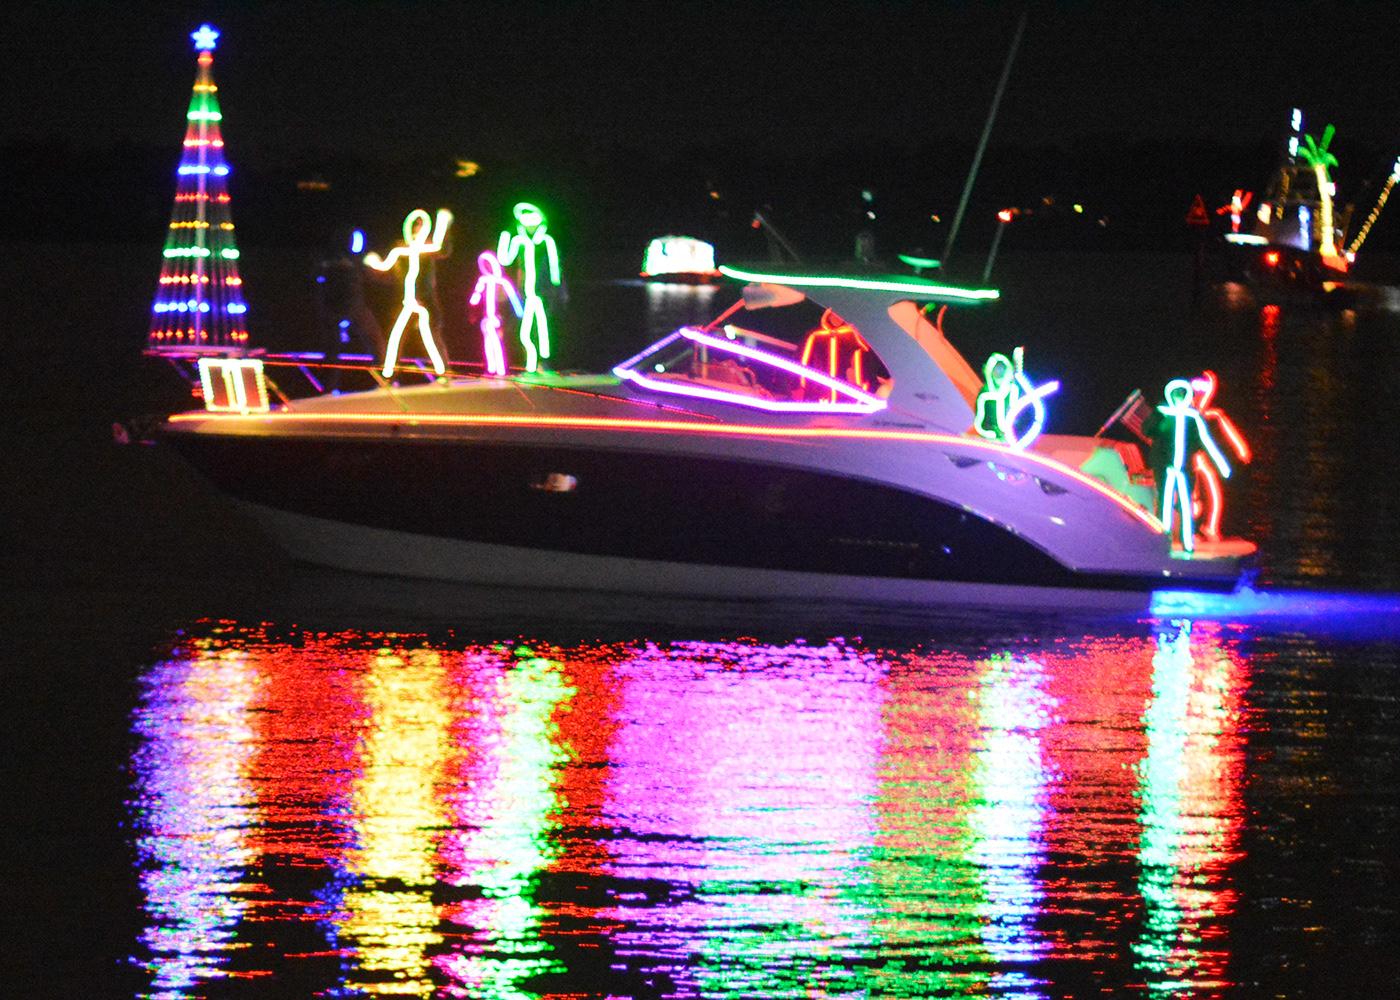 NC Holiday Flotilla Airlie Gardens Enchanted Airlie Zambelli fireworks Boat Parade Antique Auto Show Blockade Runner Resort wrightsville beach north carolina